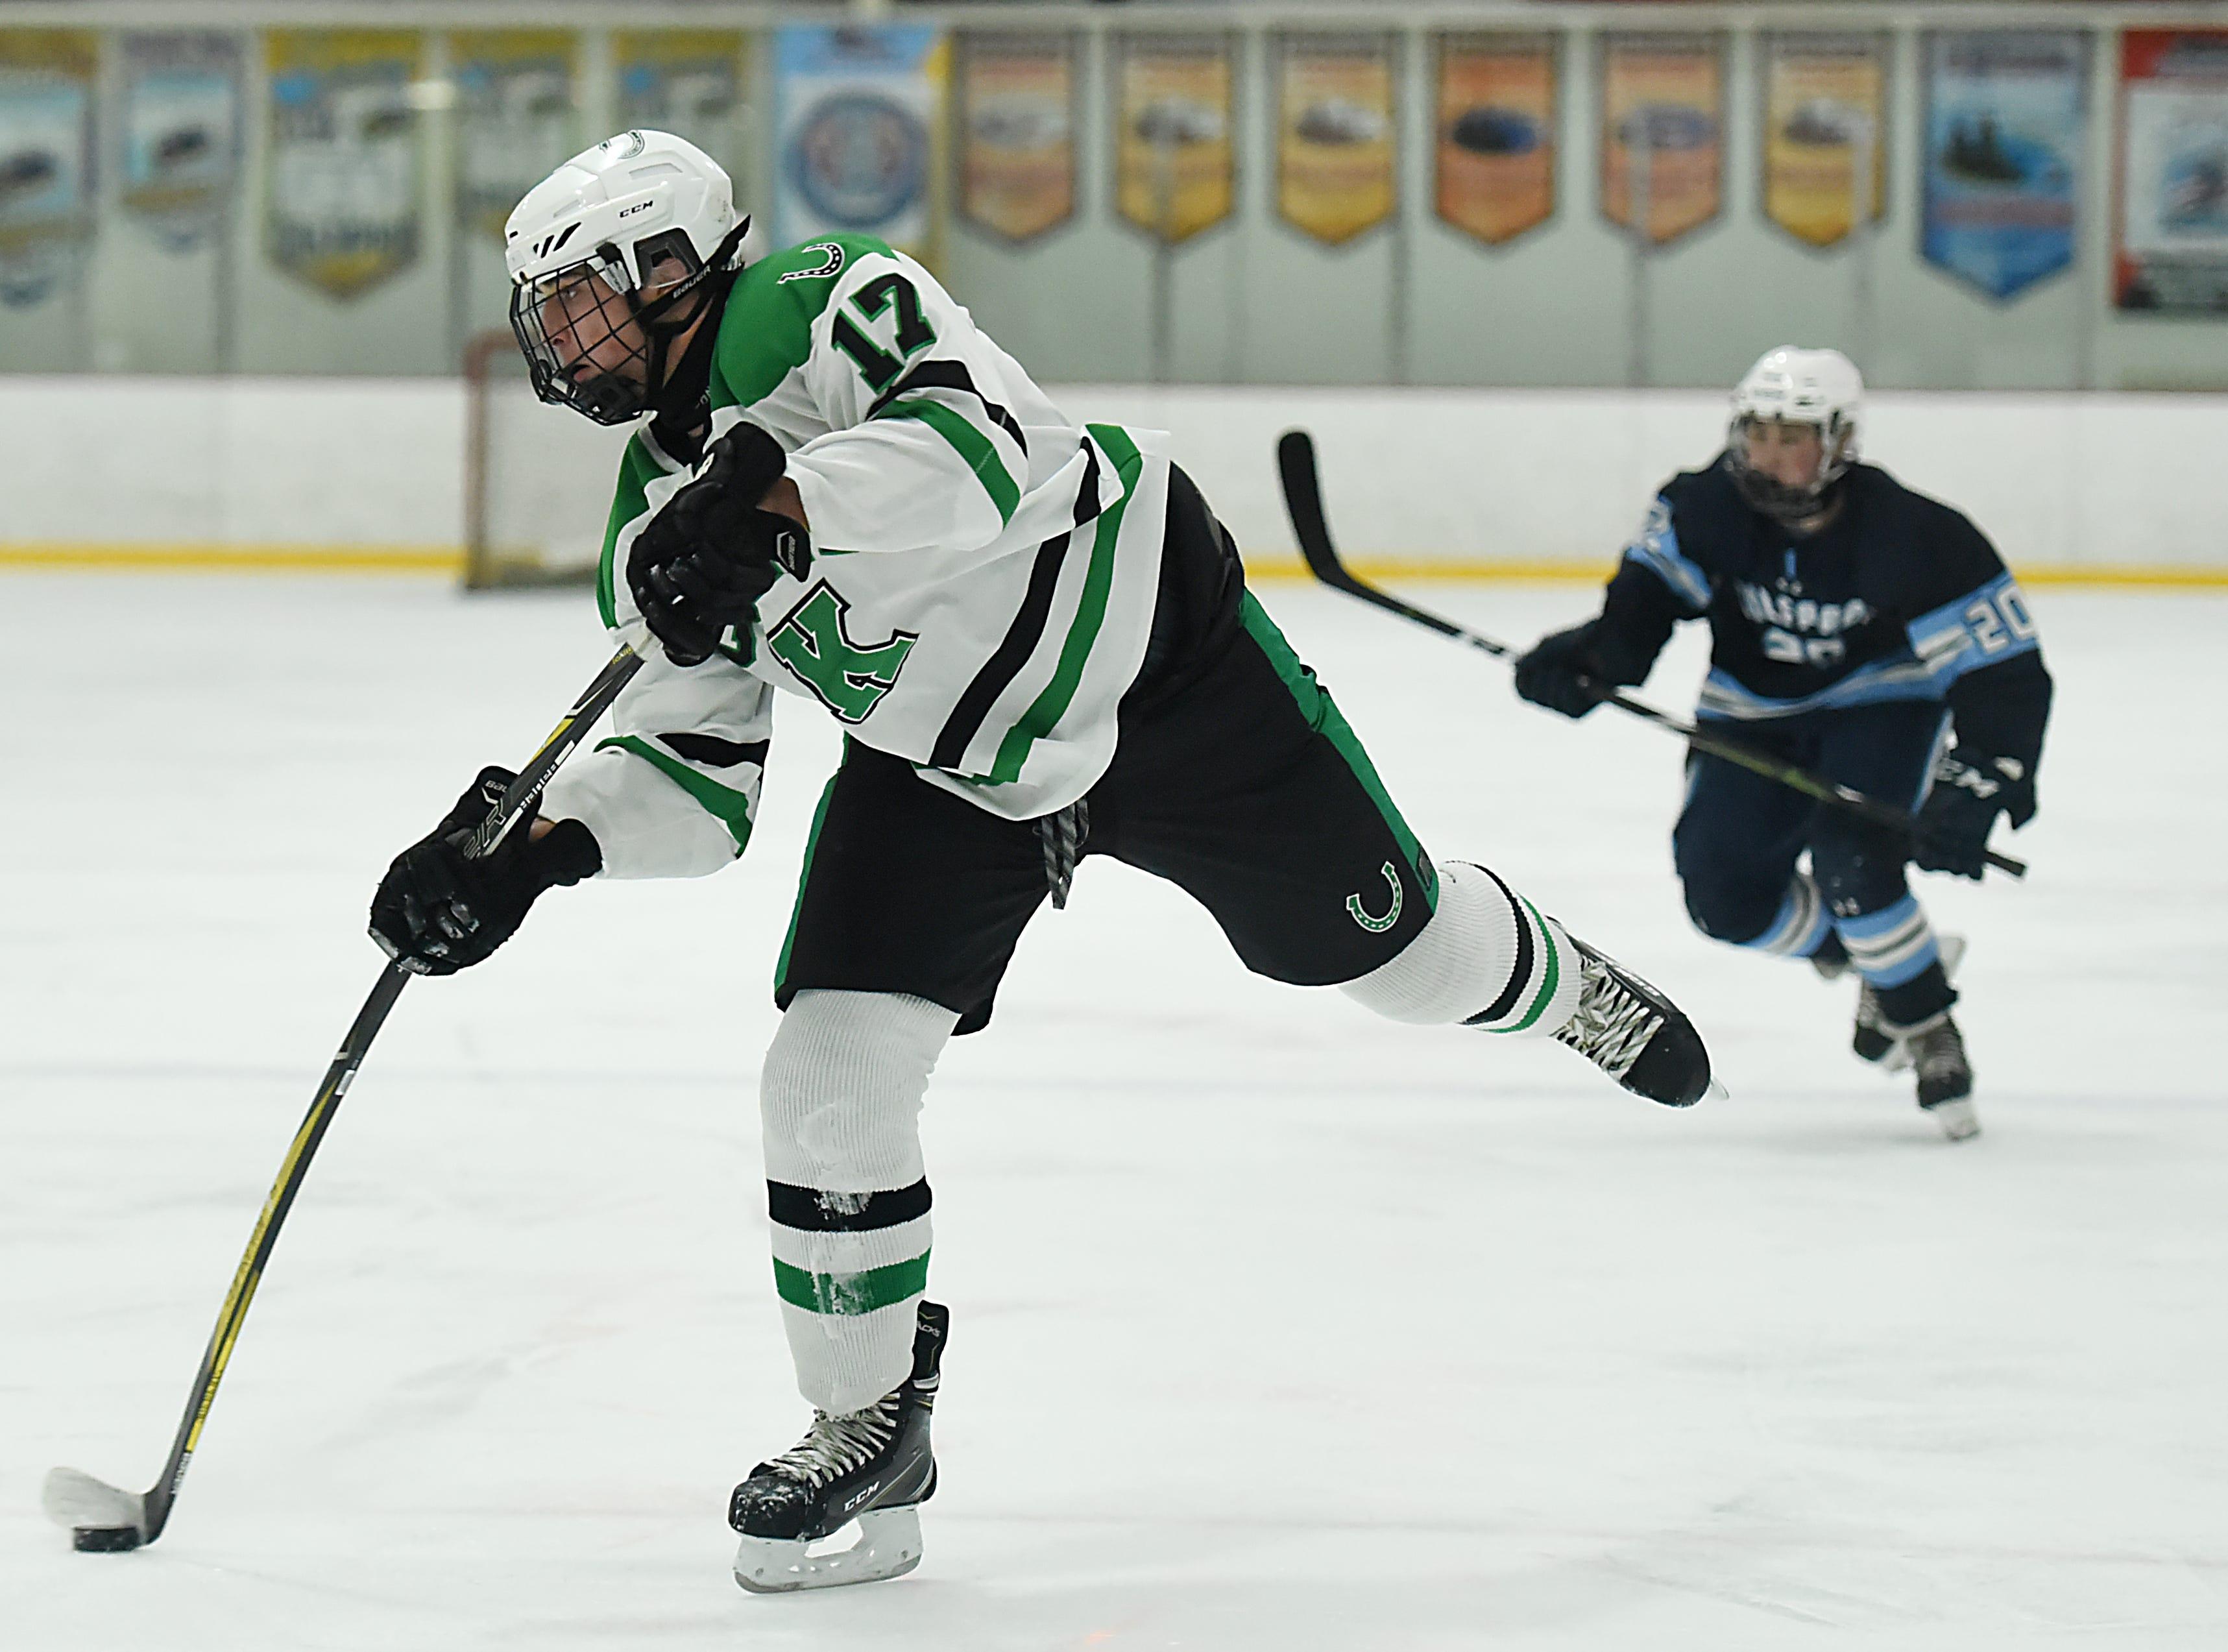 Kinnelon vs. West Morris hockey game at Skylands Ice World in Stockholm on Friday January 11, 2019. K#17 Jared Fatzer shoots.